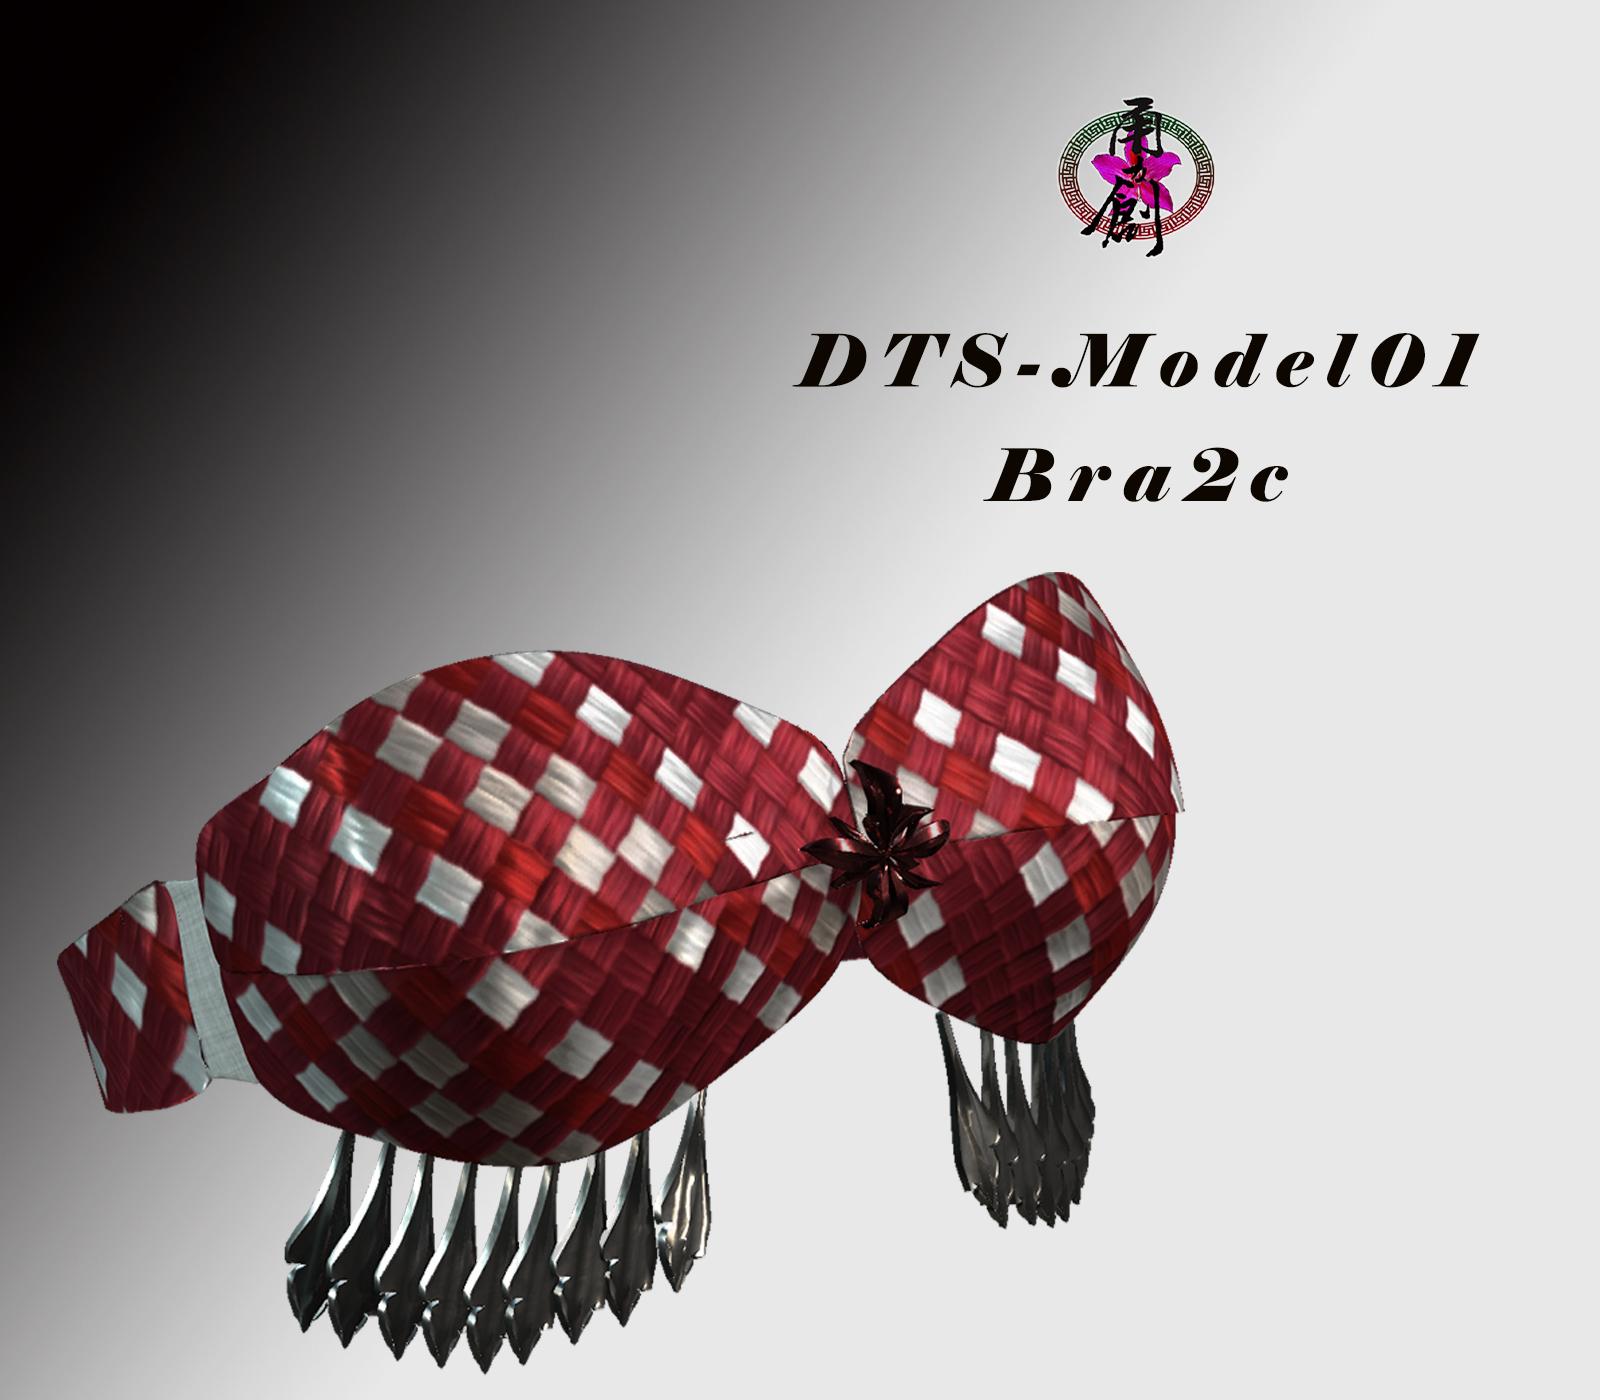 DTS-Model01-Bra2C